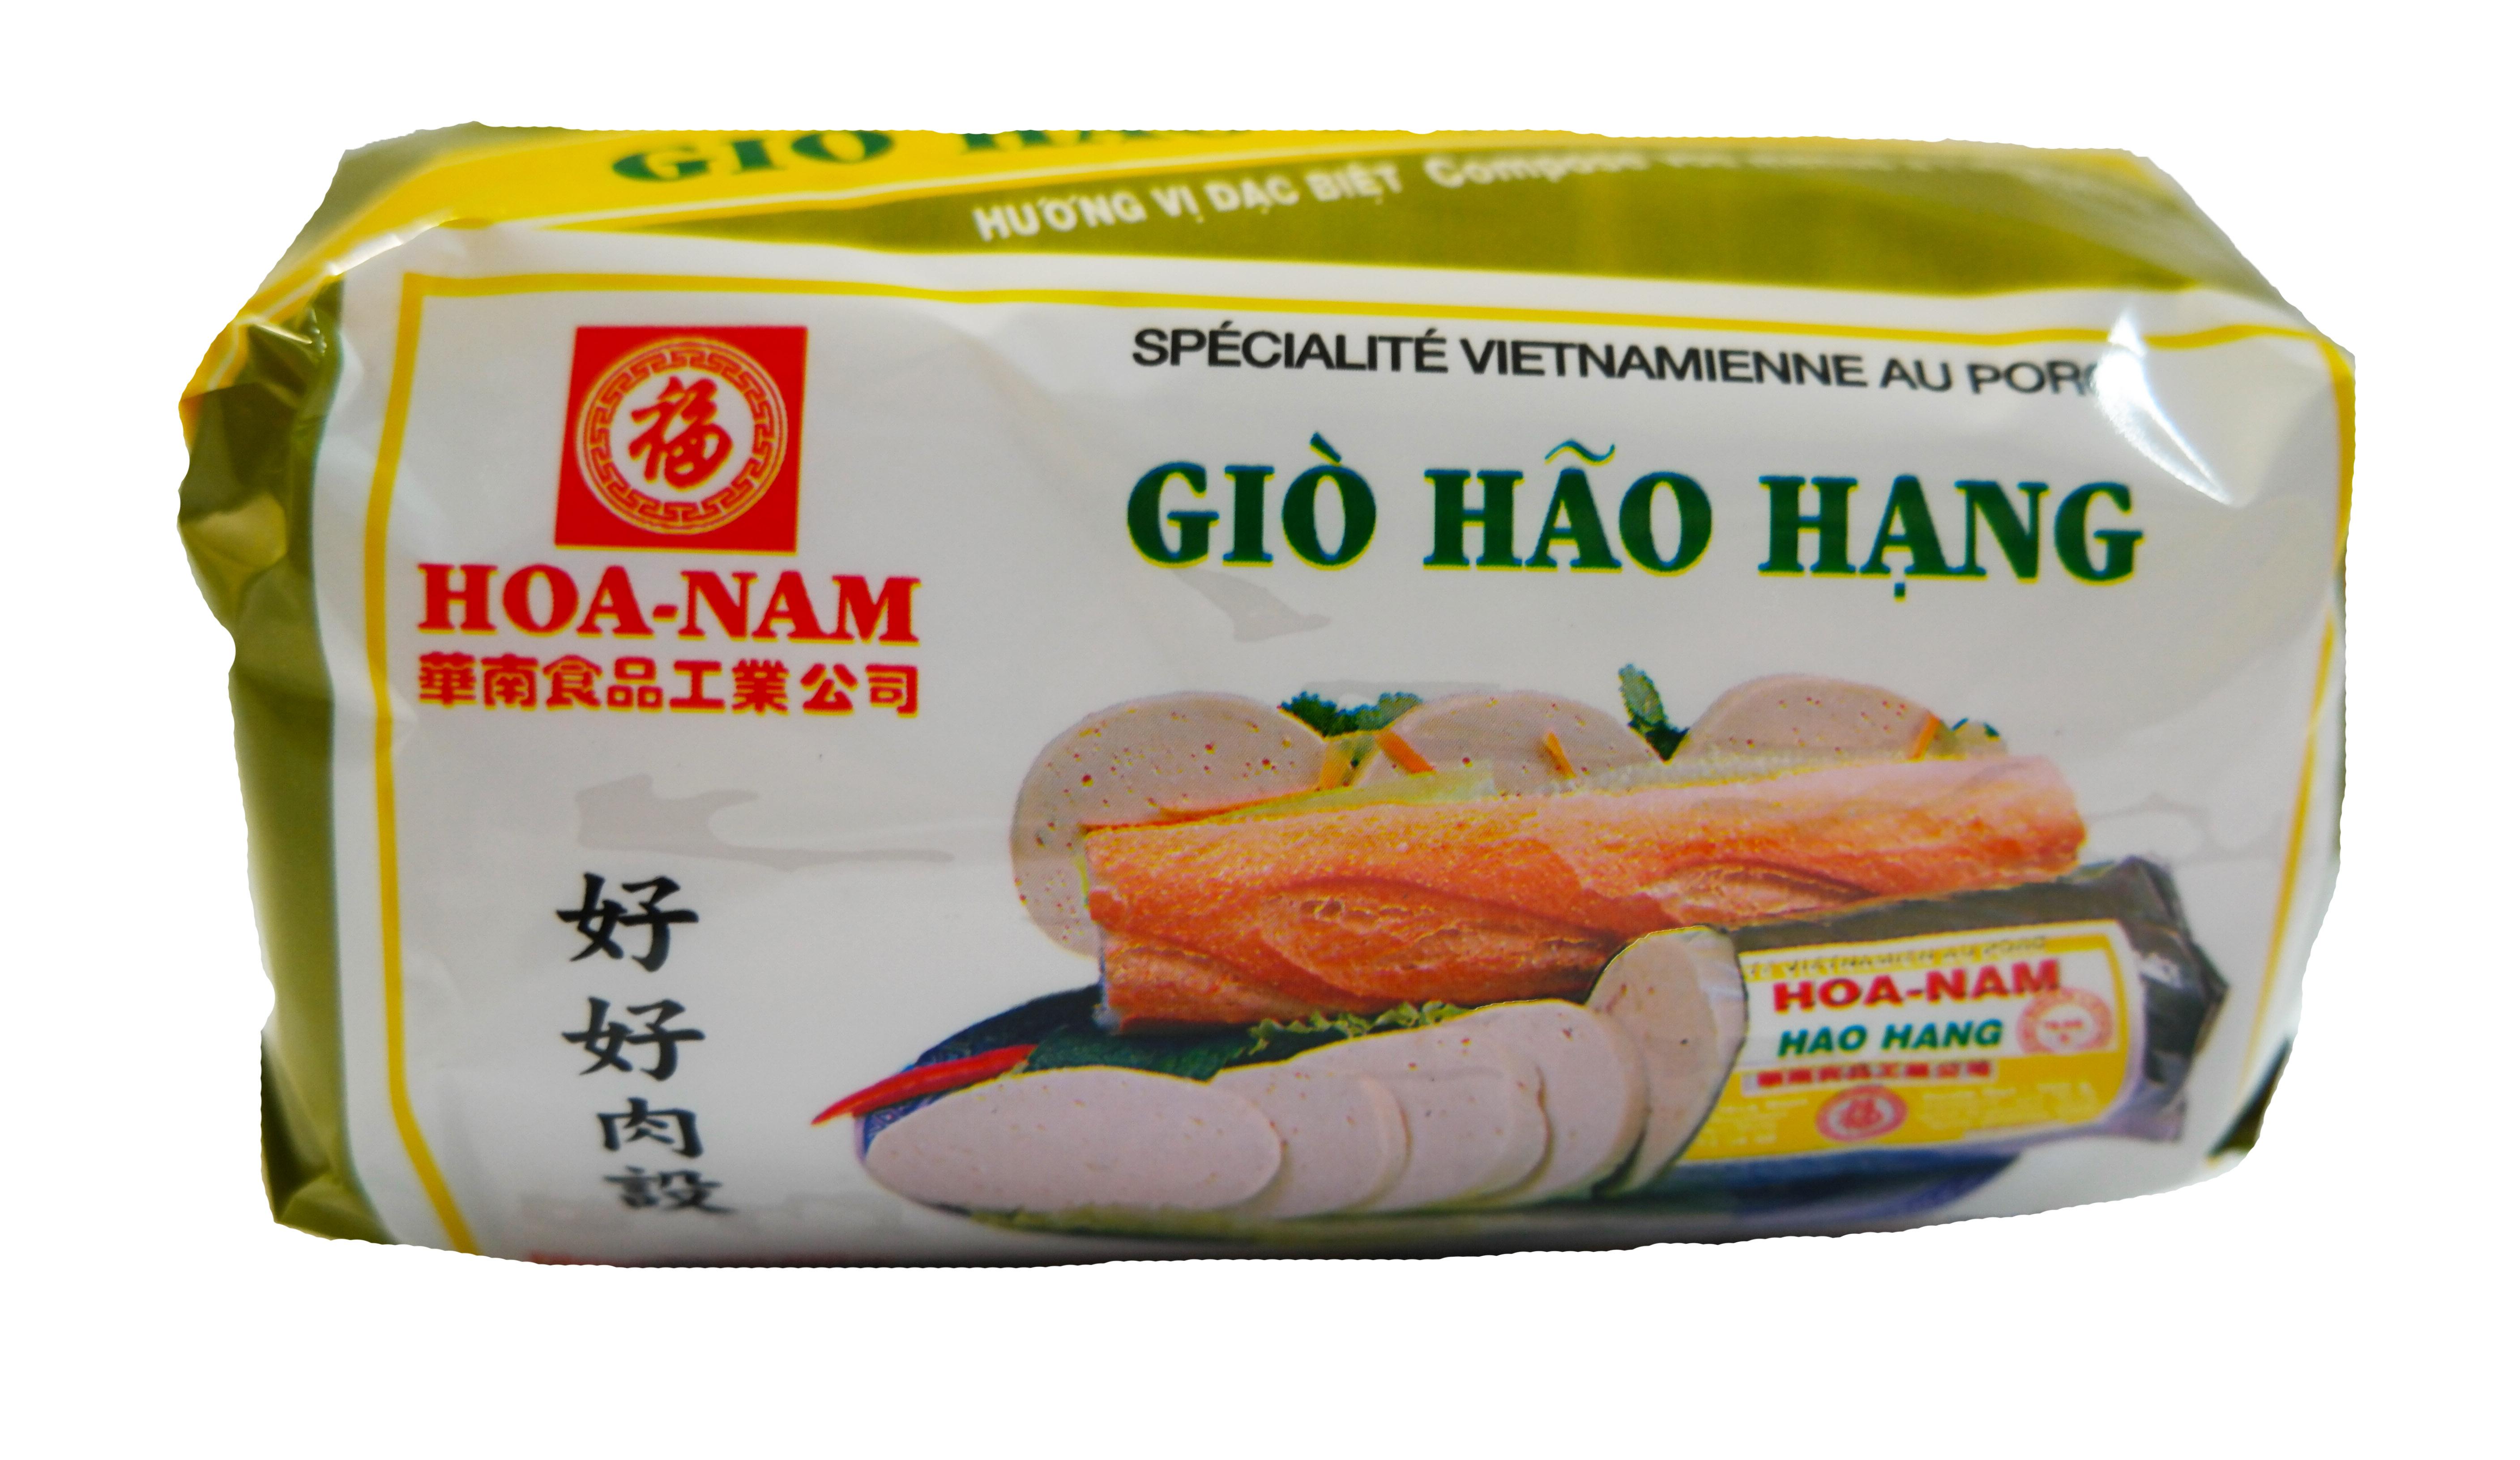 Pâté vietnamien au porc Gio Hao Hang, Hoanam (500 g)